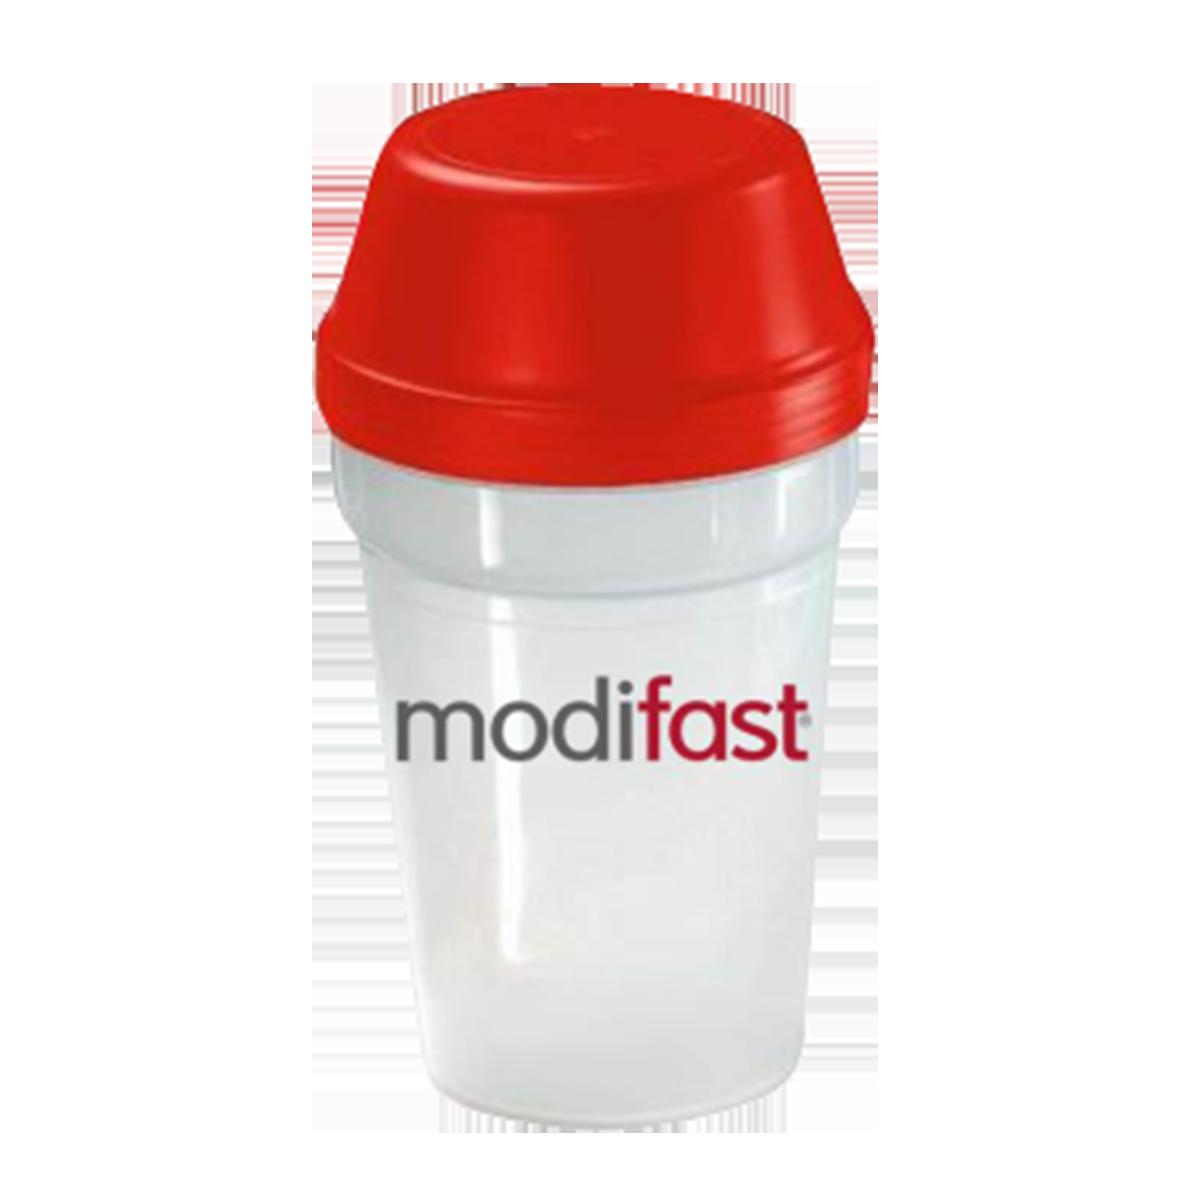 Modifast Shaker 1 Stk.